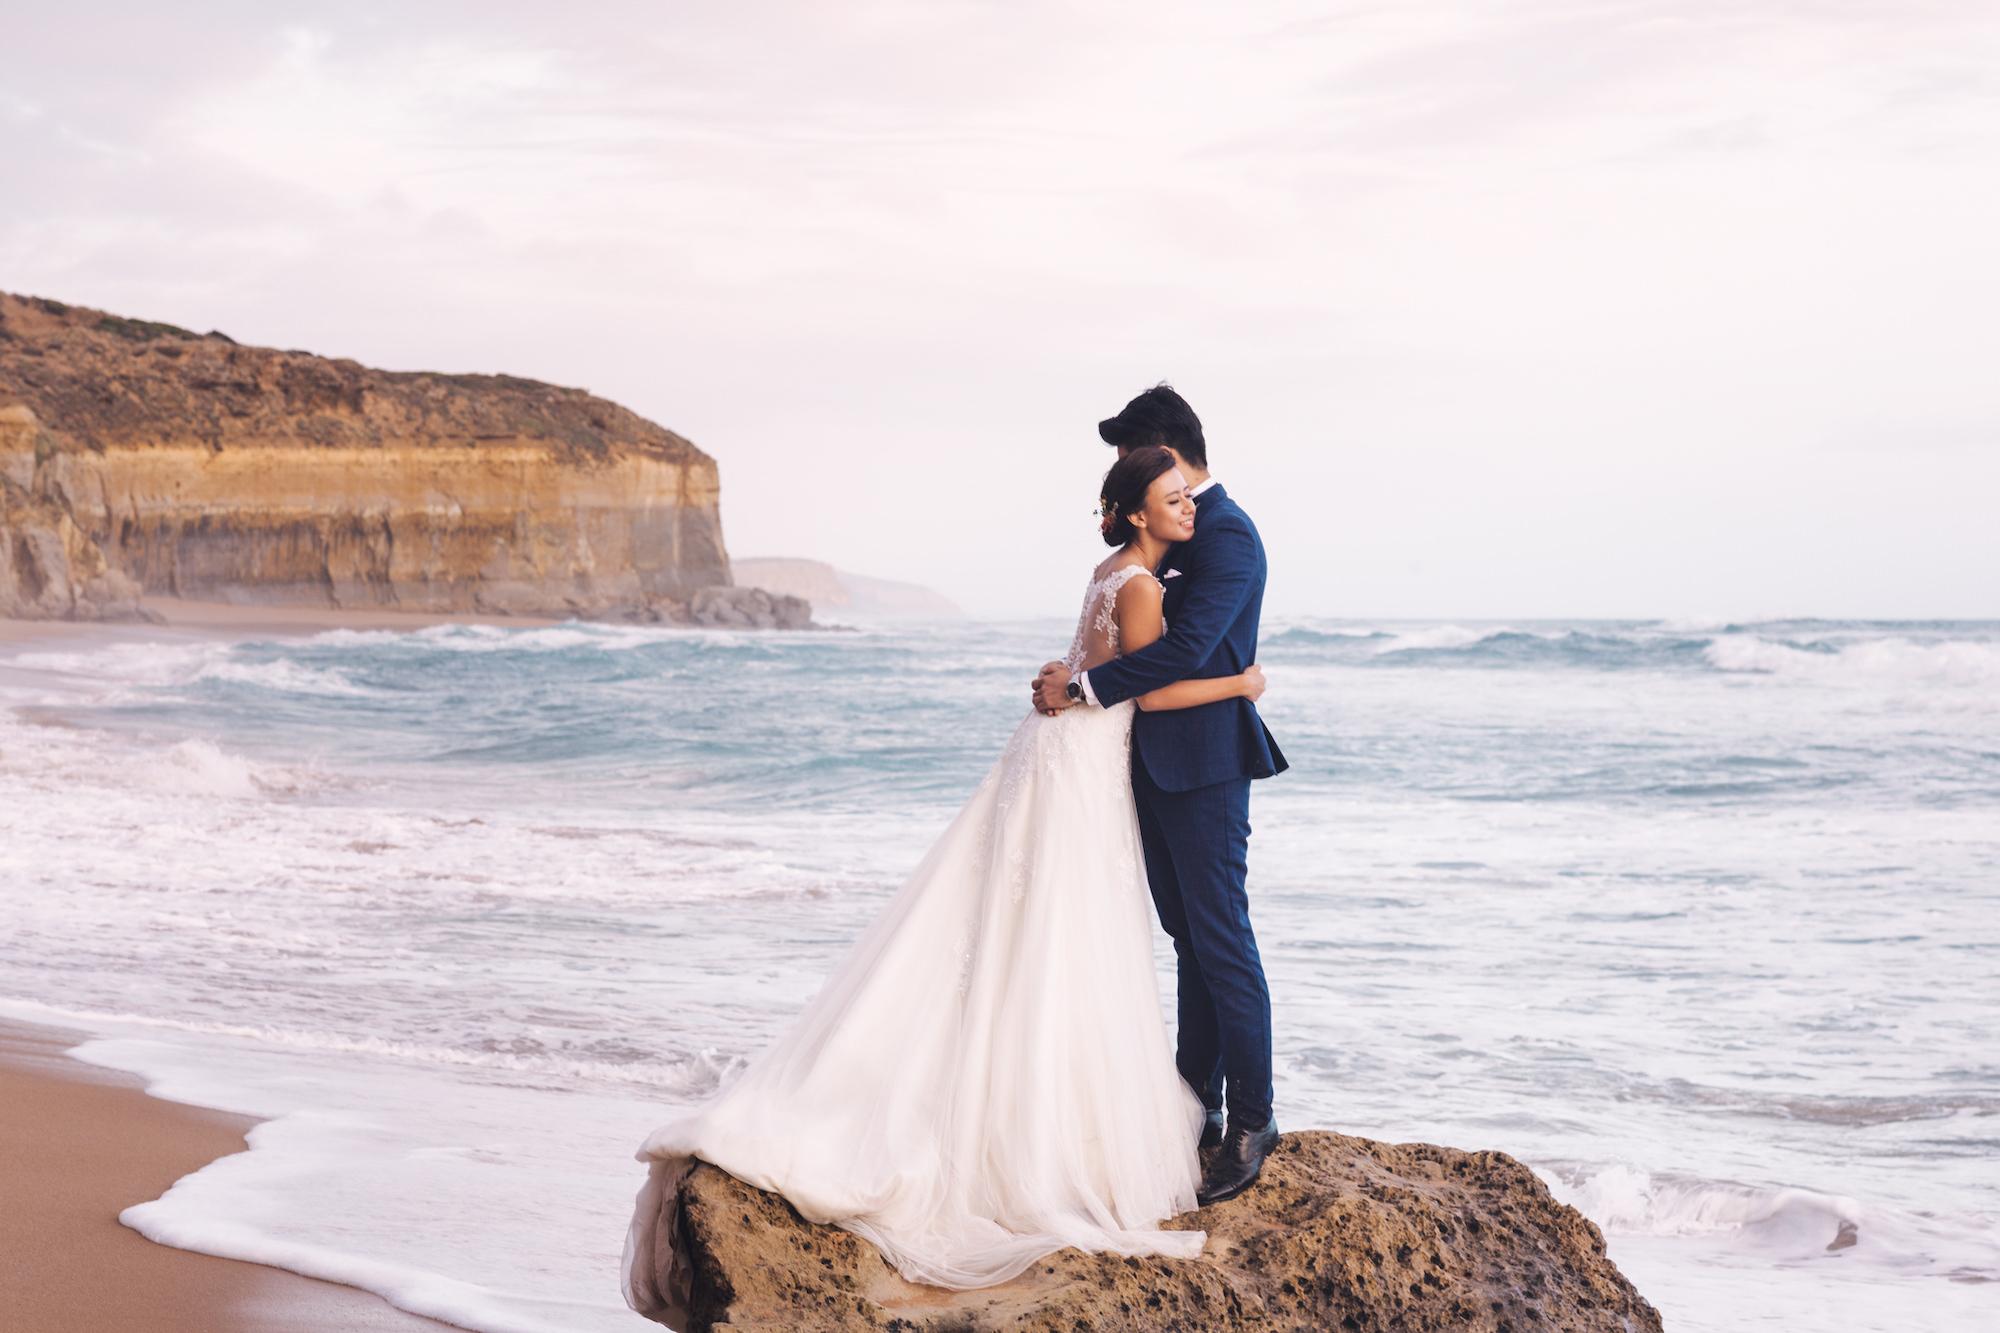 Claire & Charles - Melbourne Prewedding 5.jpg